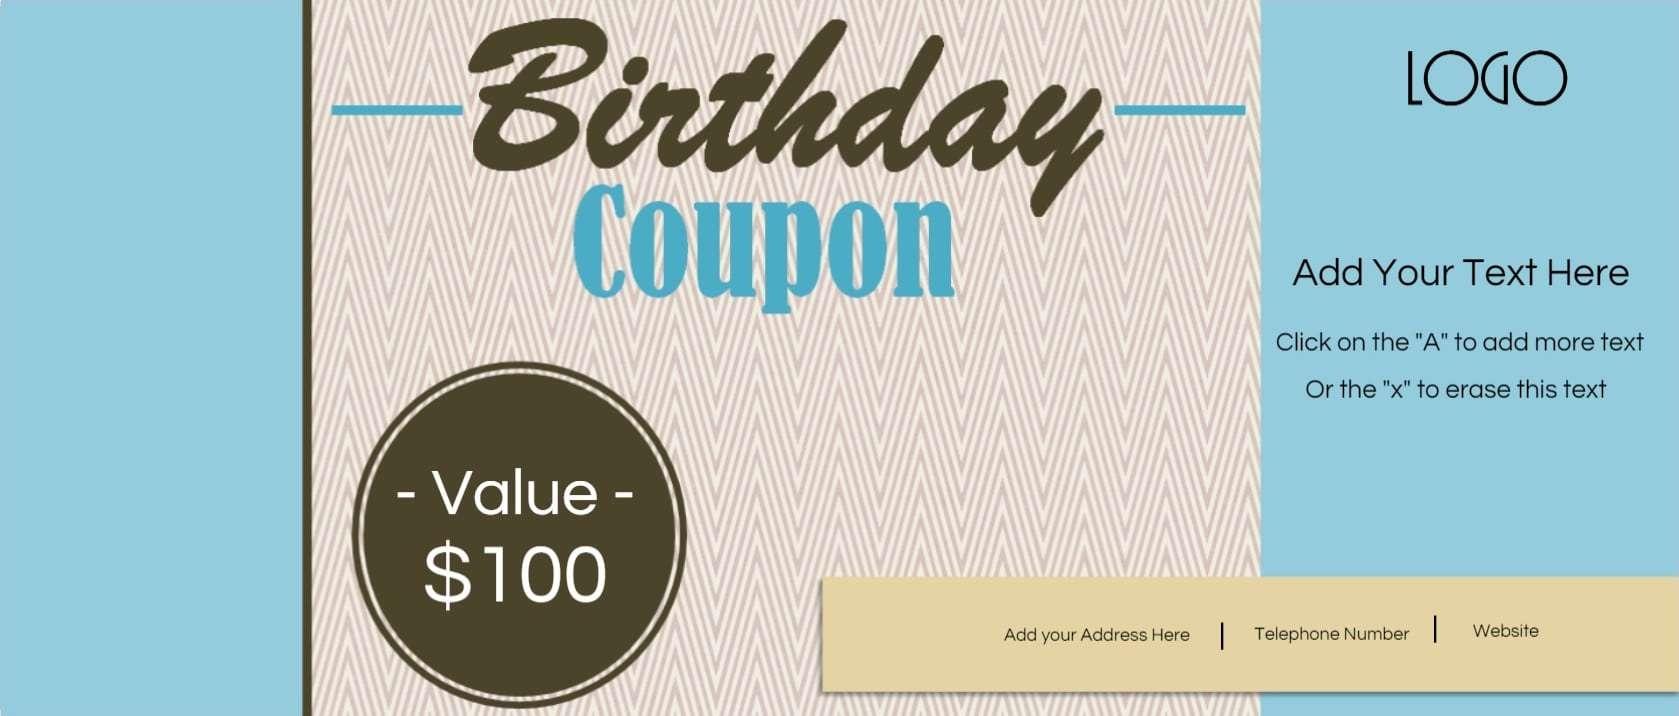 Free Custom Birthday Coupons - Customize Online & Print At Home - Free Printable Blank Birthday Coupons